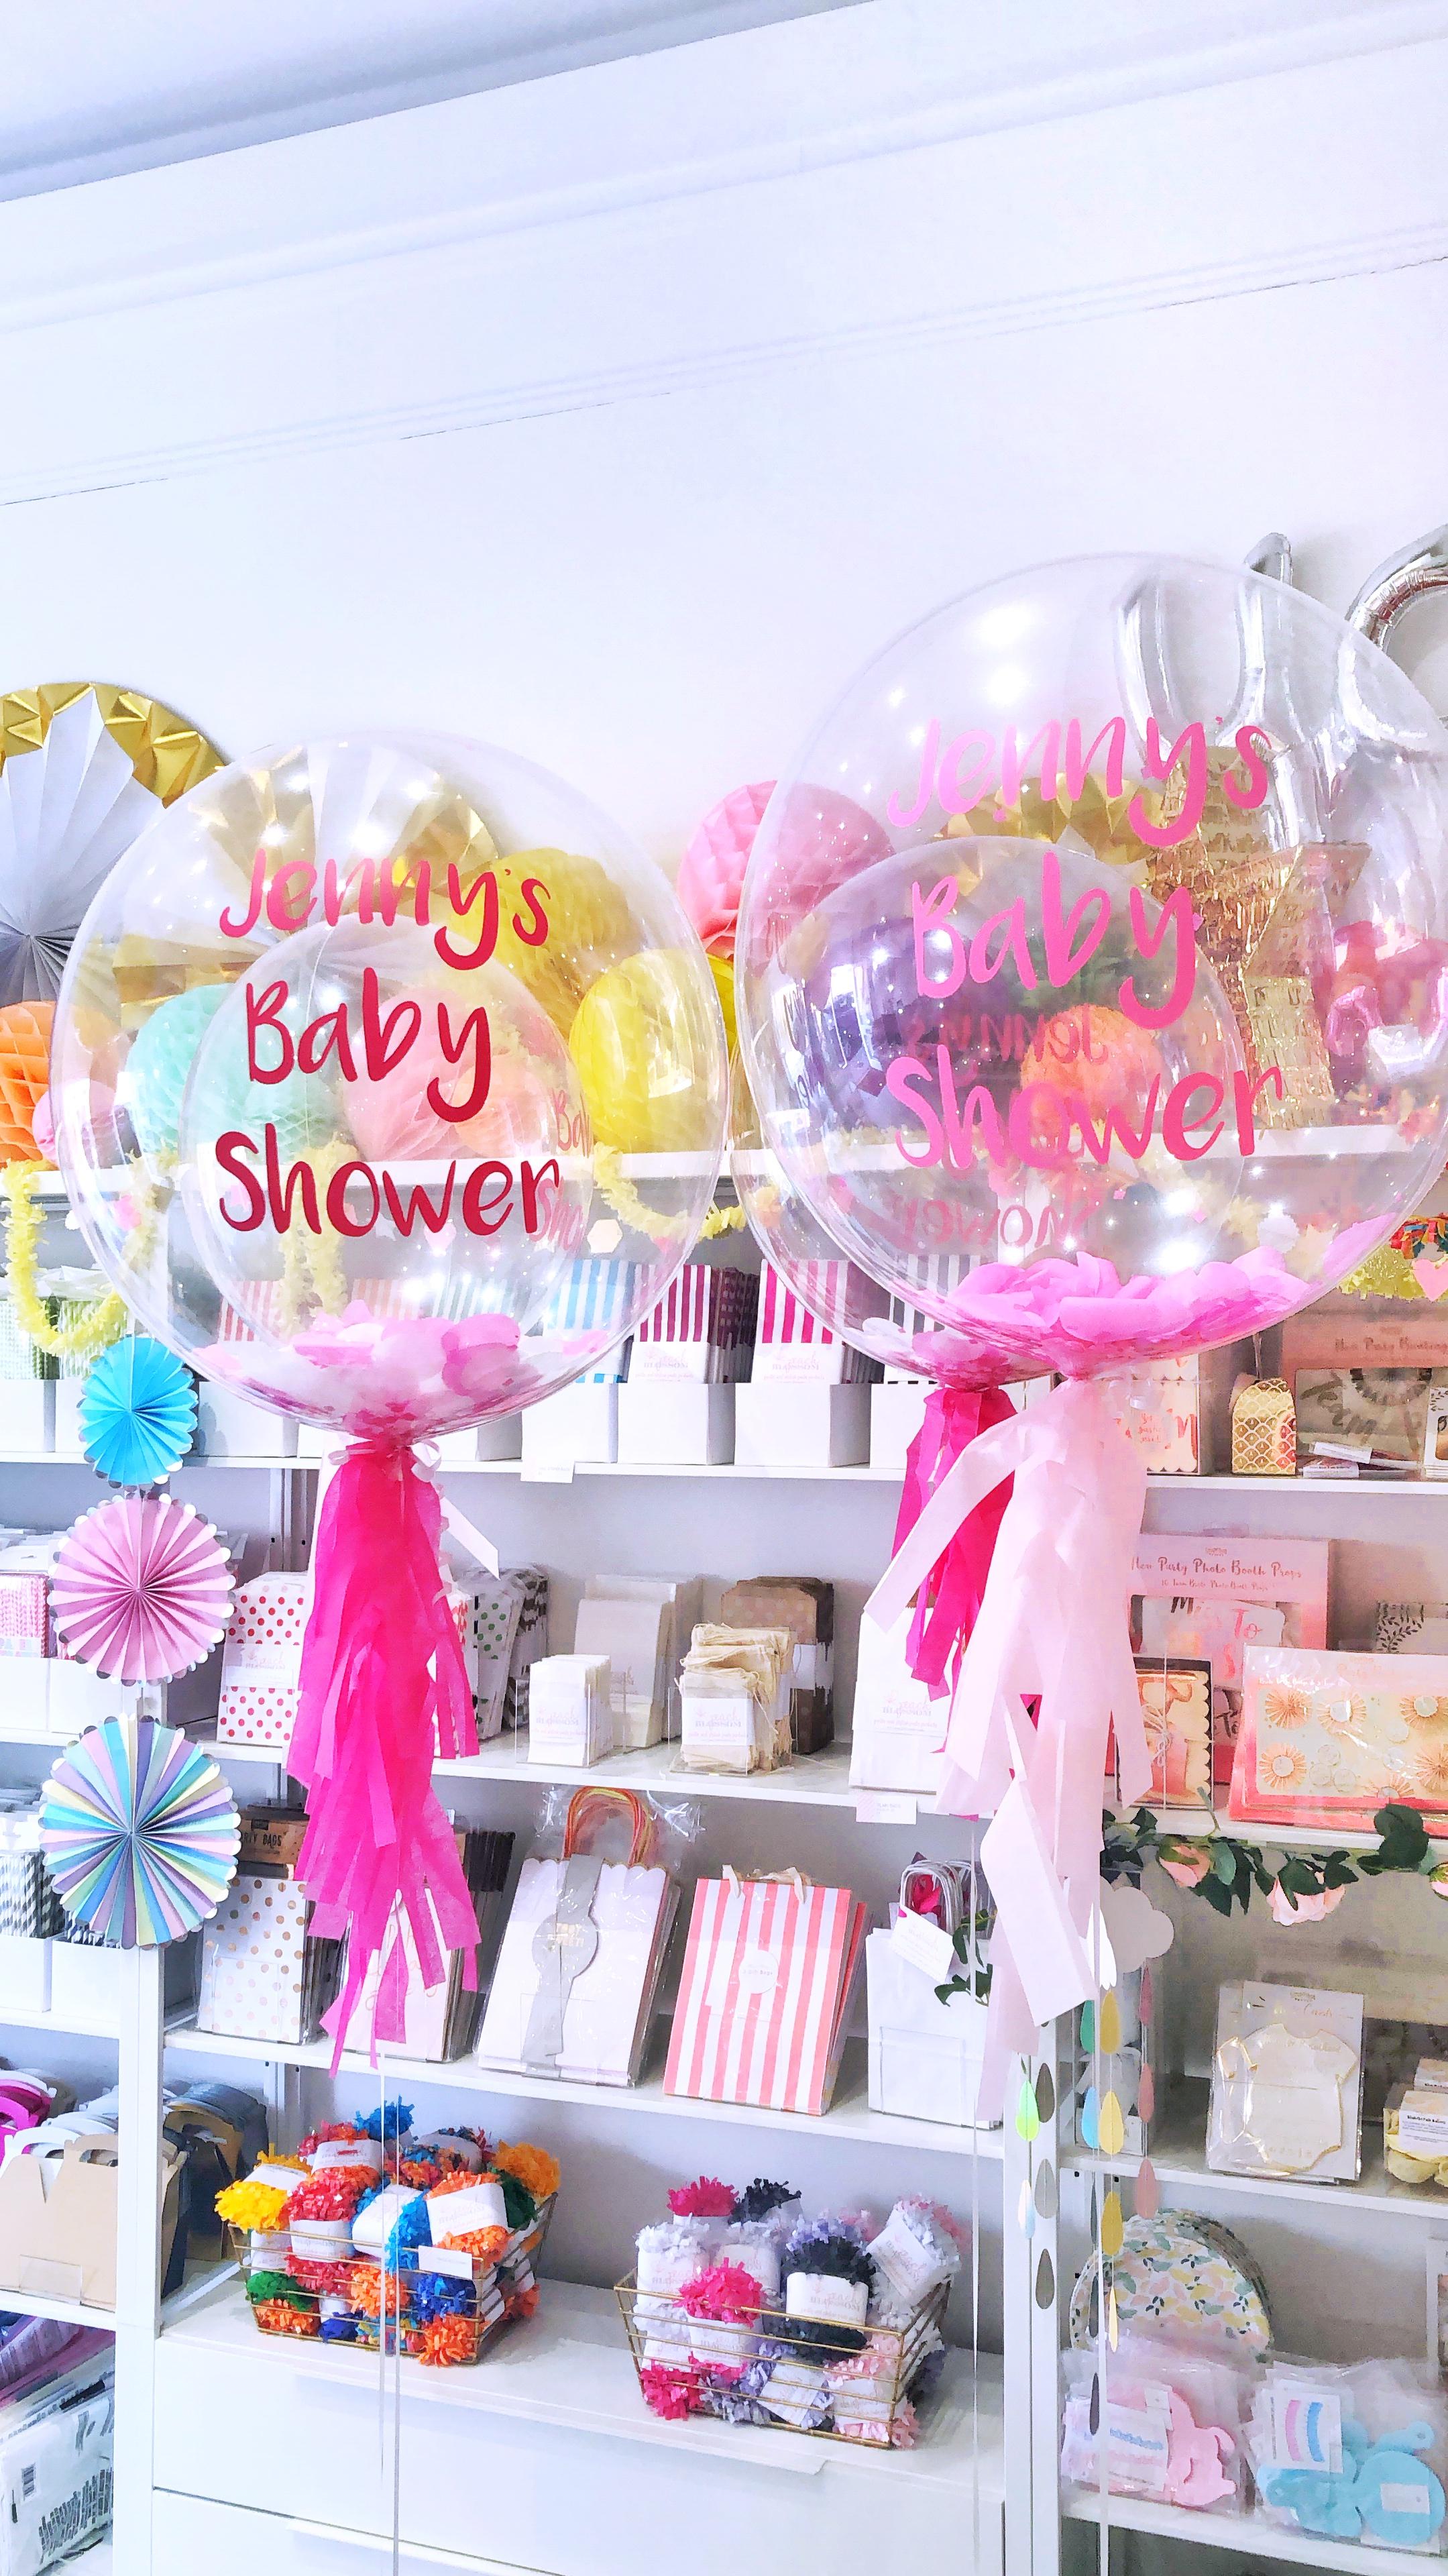 baby-shower-confetti-filled-balloon.jpg